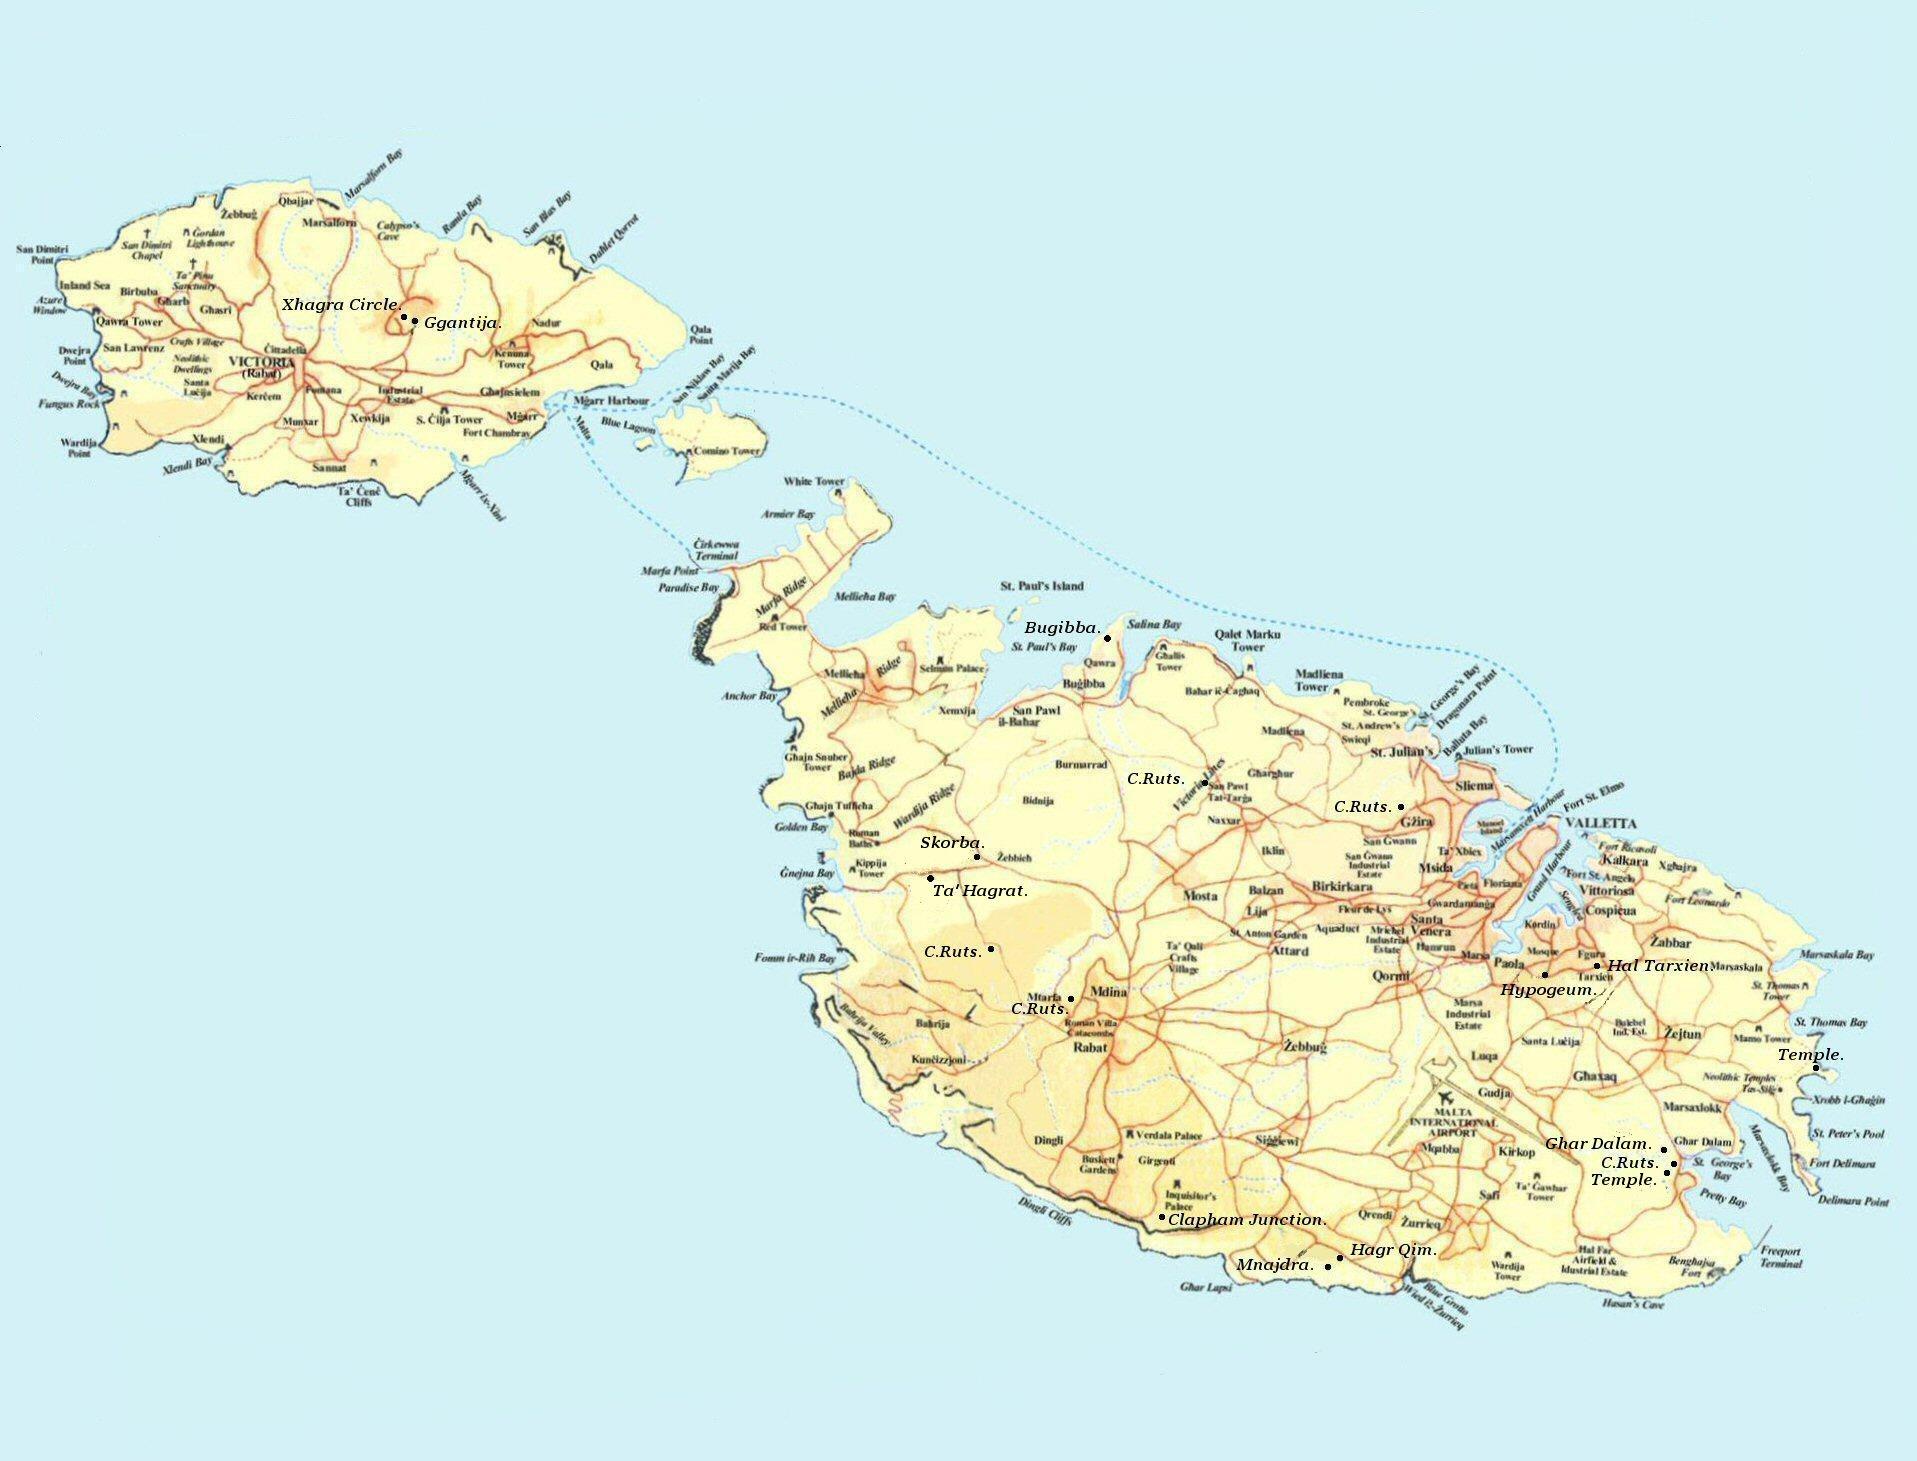 Cartruts Malta - Malta maps with countries